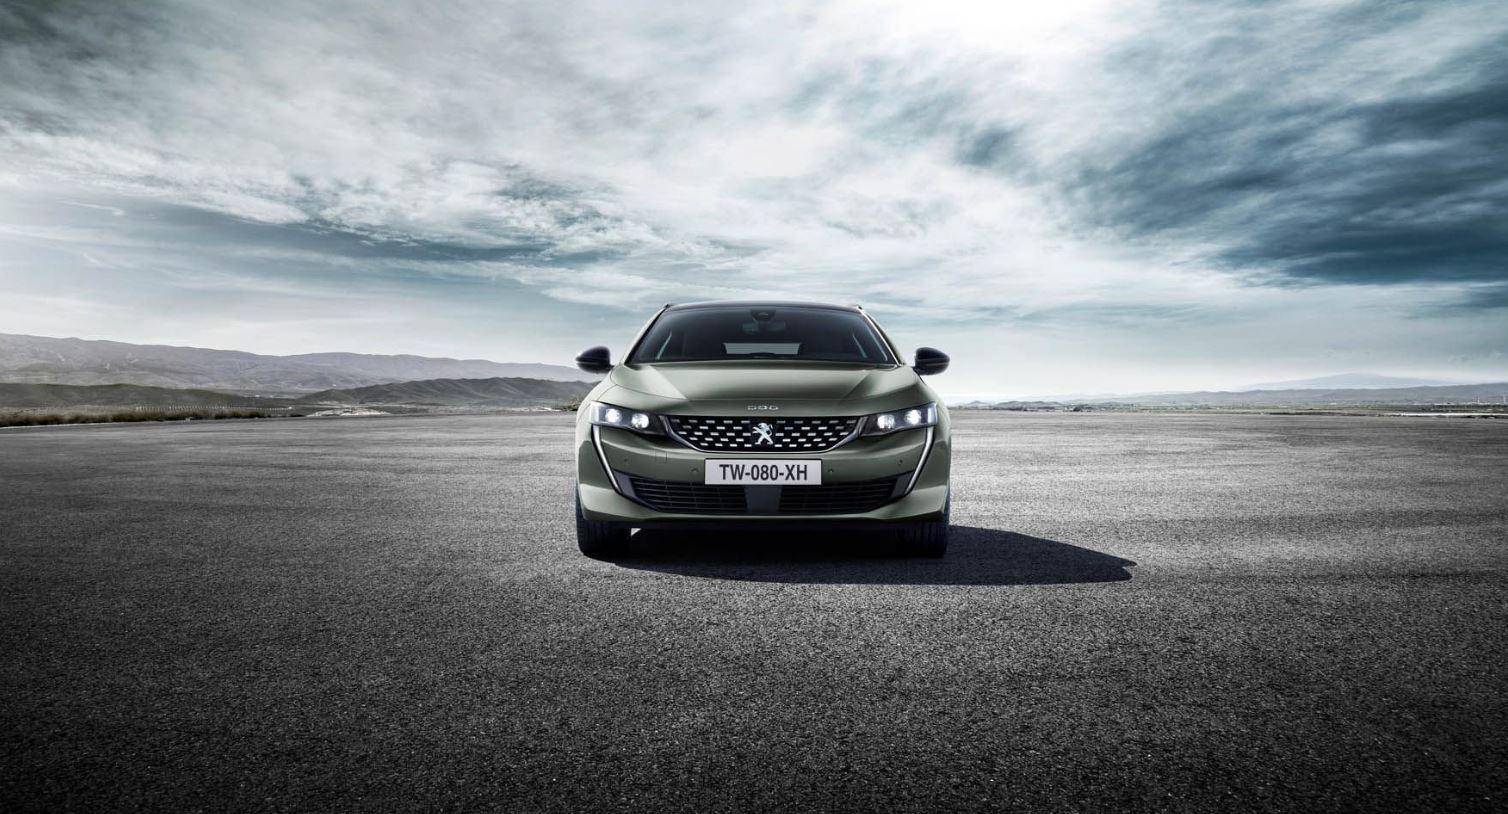 Honda Accord Sedan >> 2019 Peugeot 508 station wagon ortaya çıktı | Donanım Haber